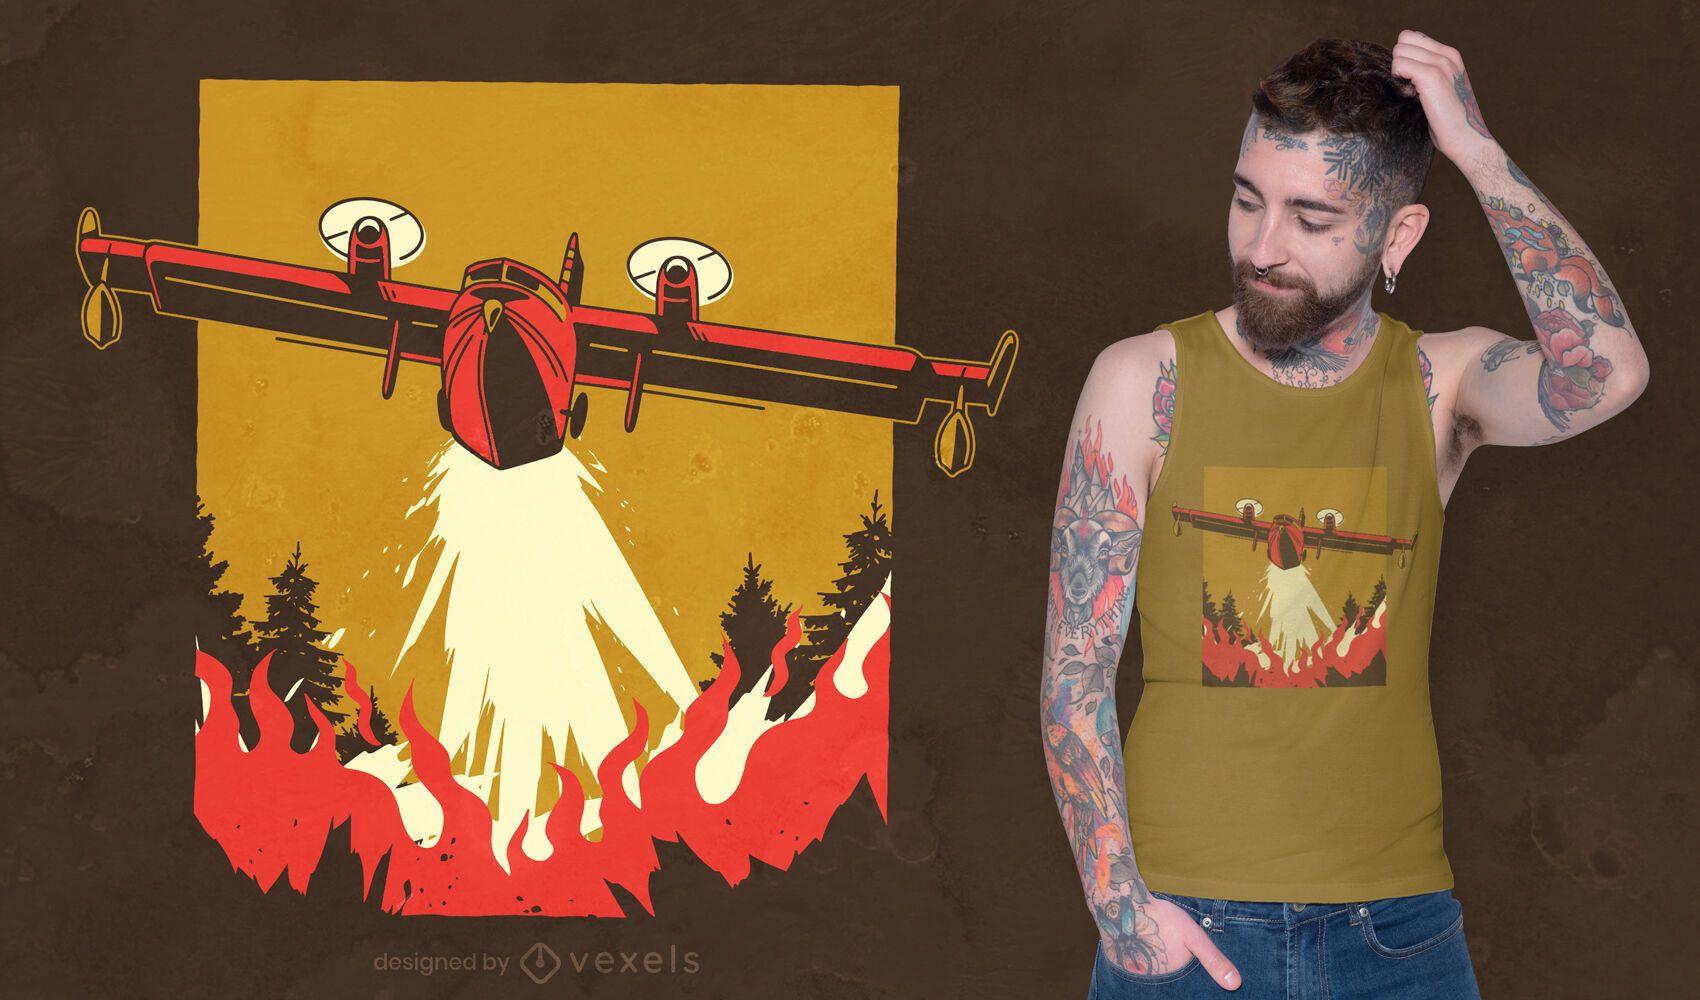 Dise?o de camiseta de extinci?n de incendios a?rea.